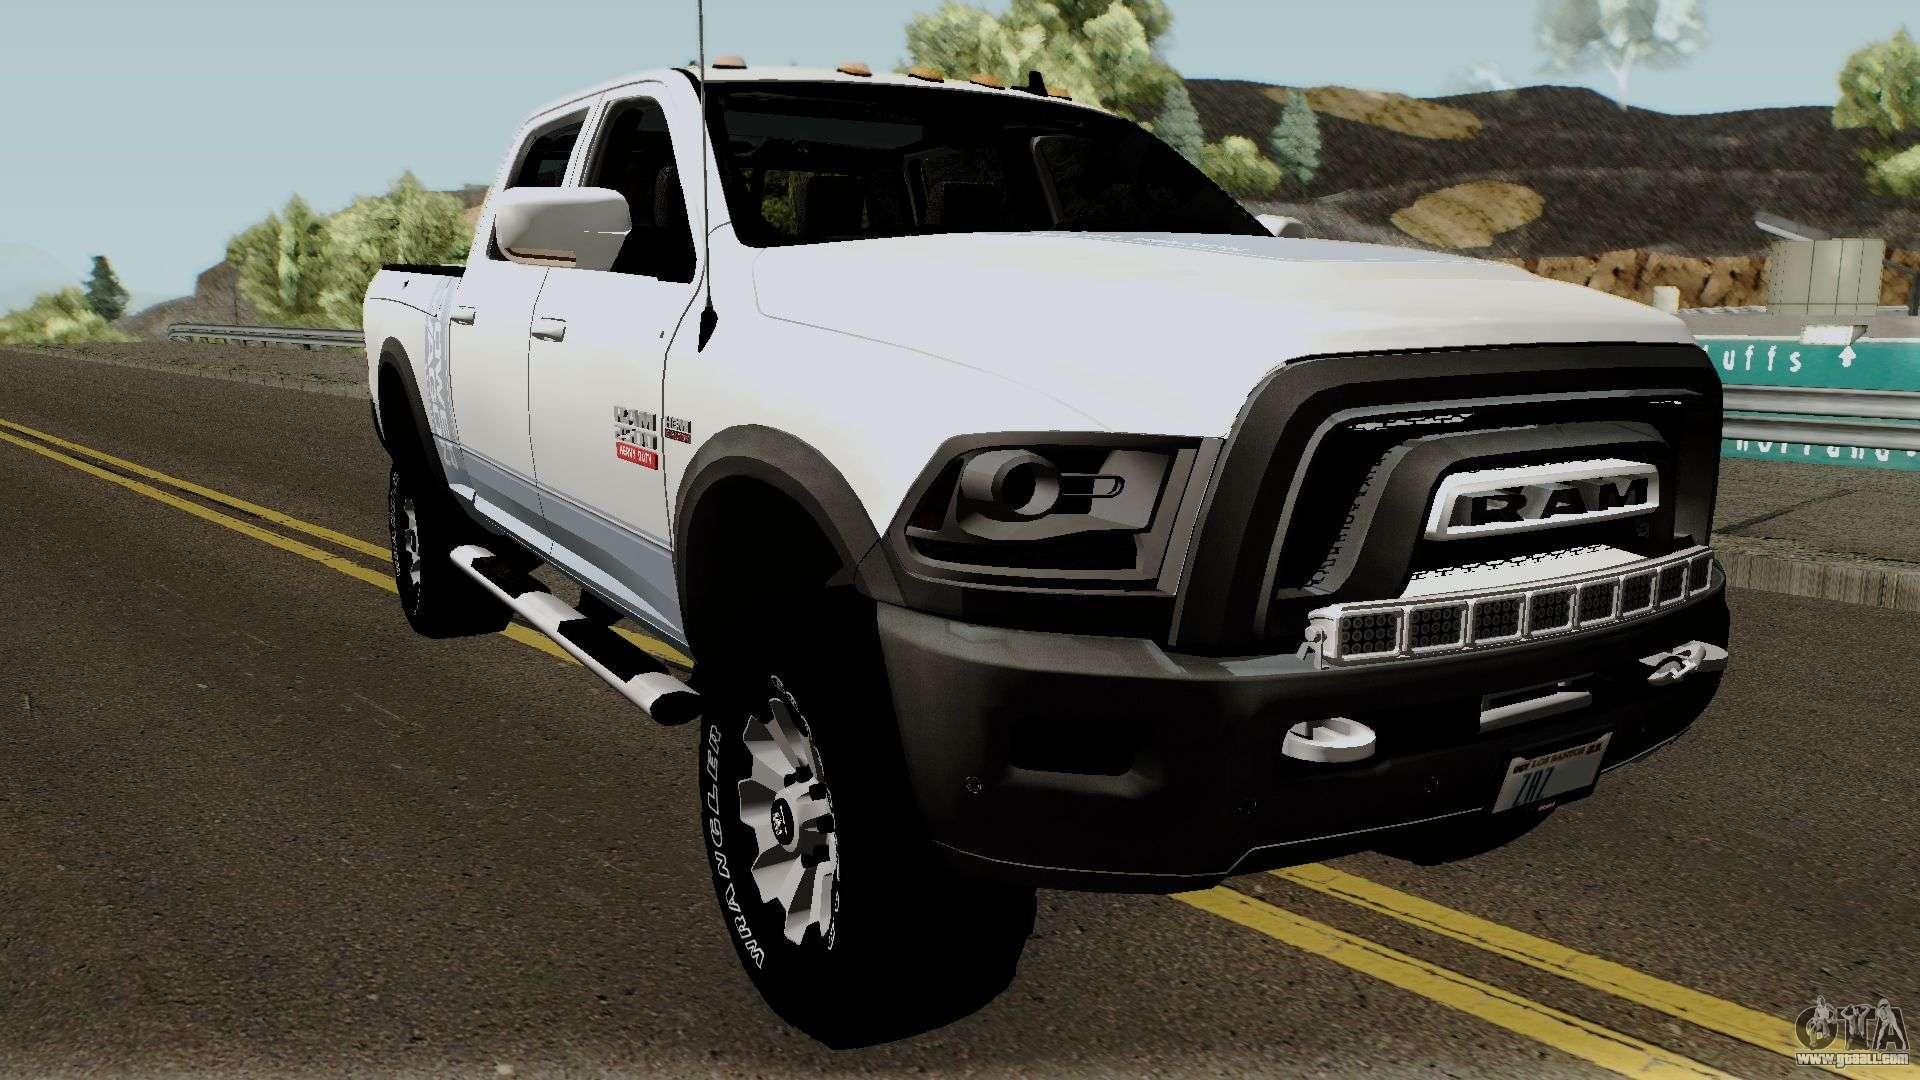 ram 2500 dodge wagon power gta andreas san truck american mod nice body cars detailed